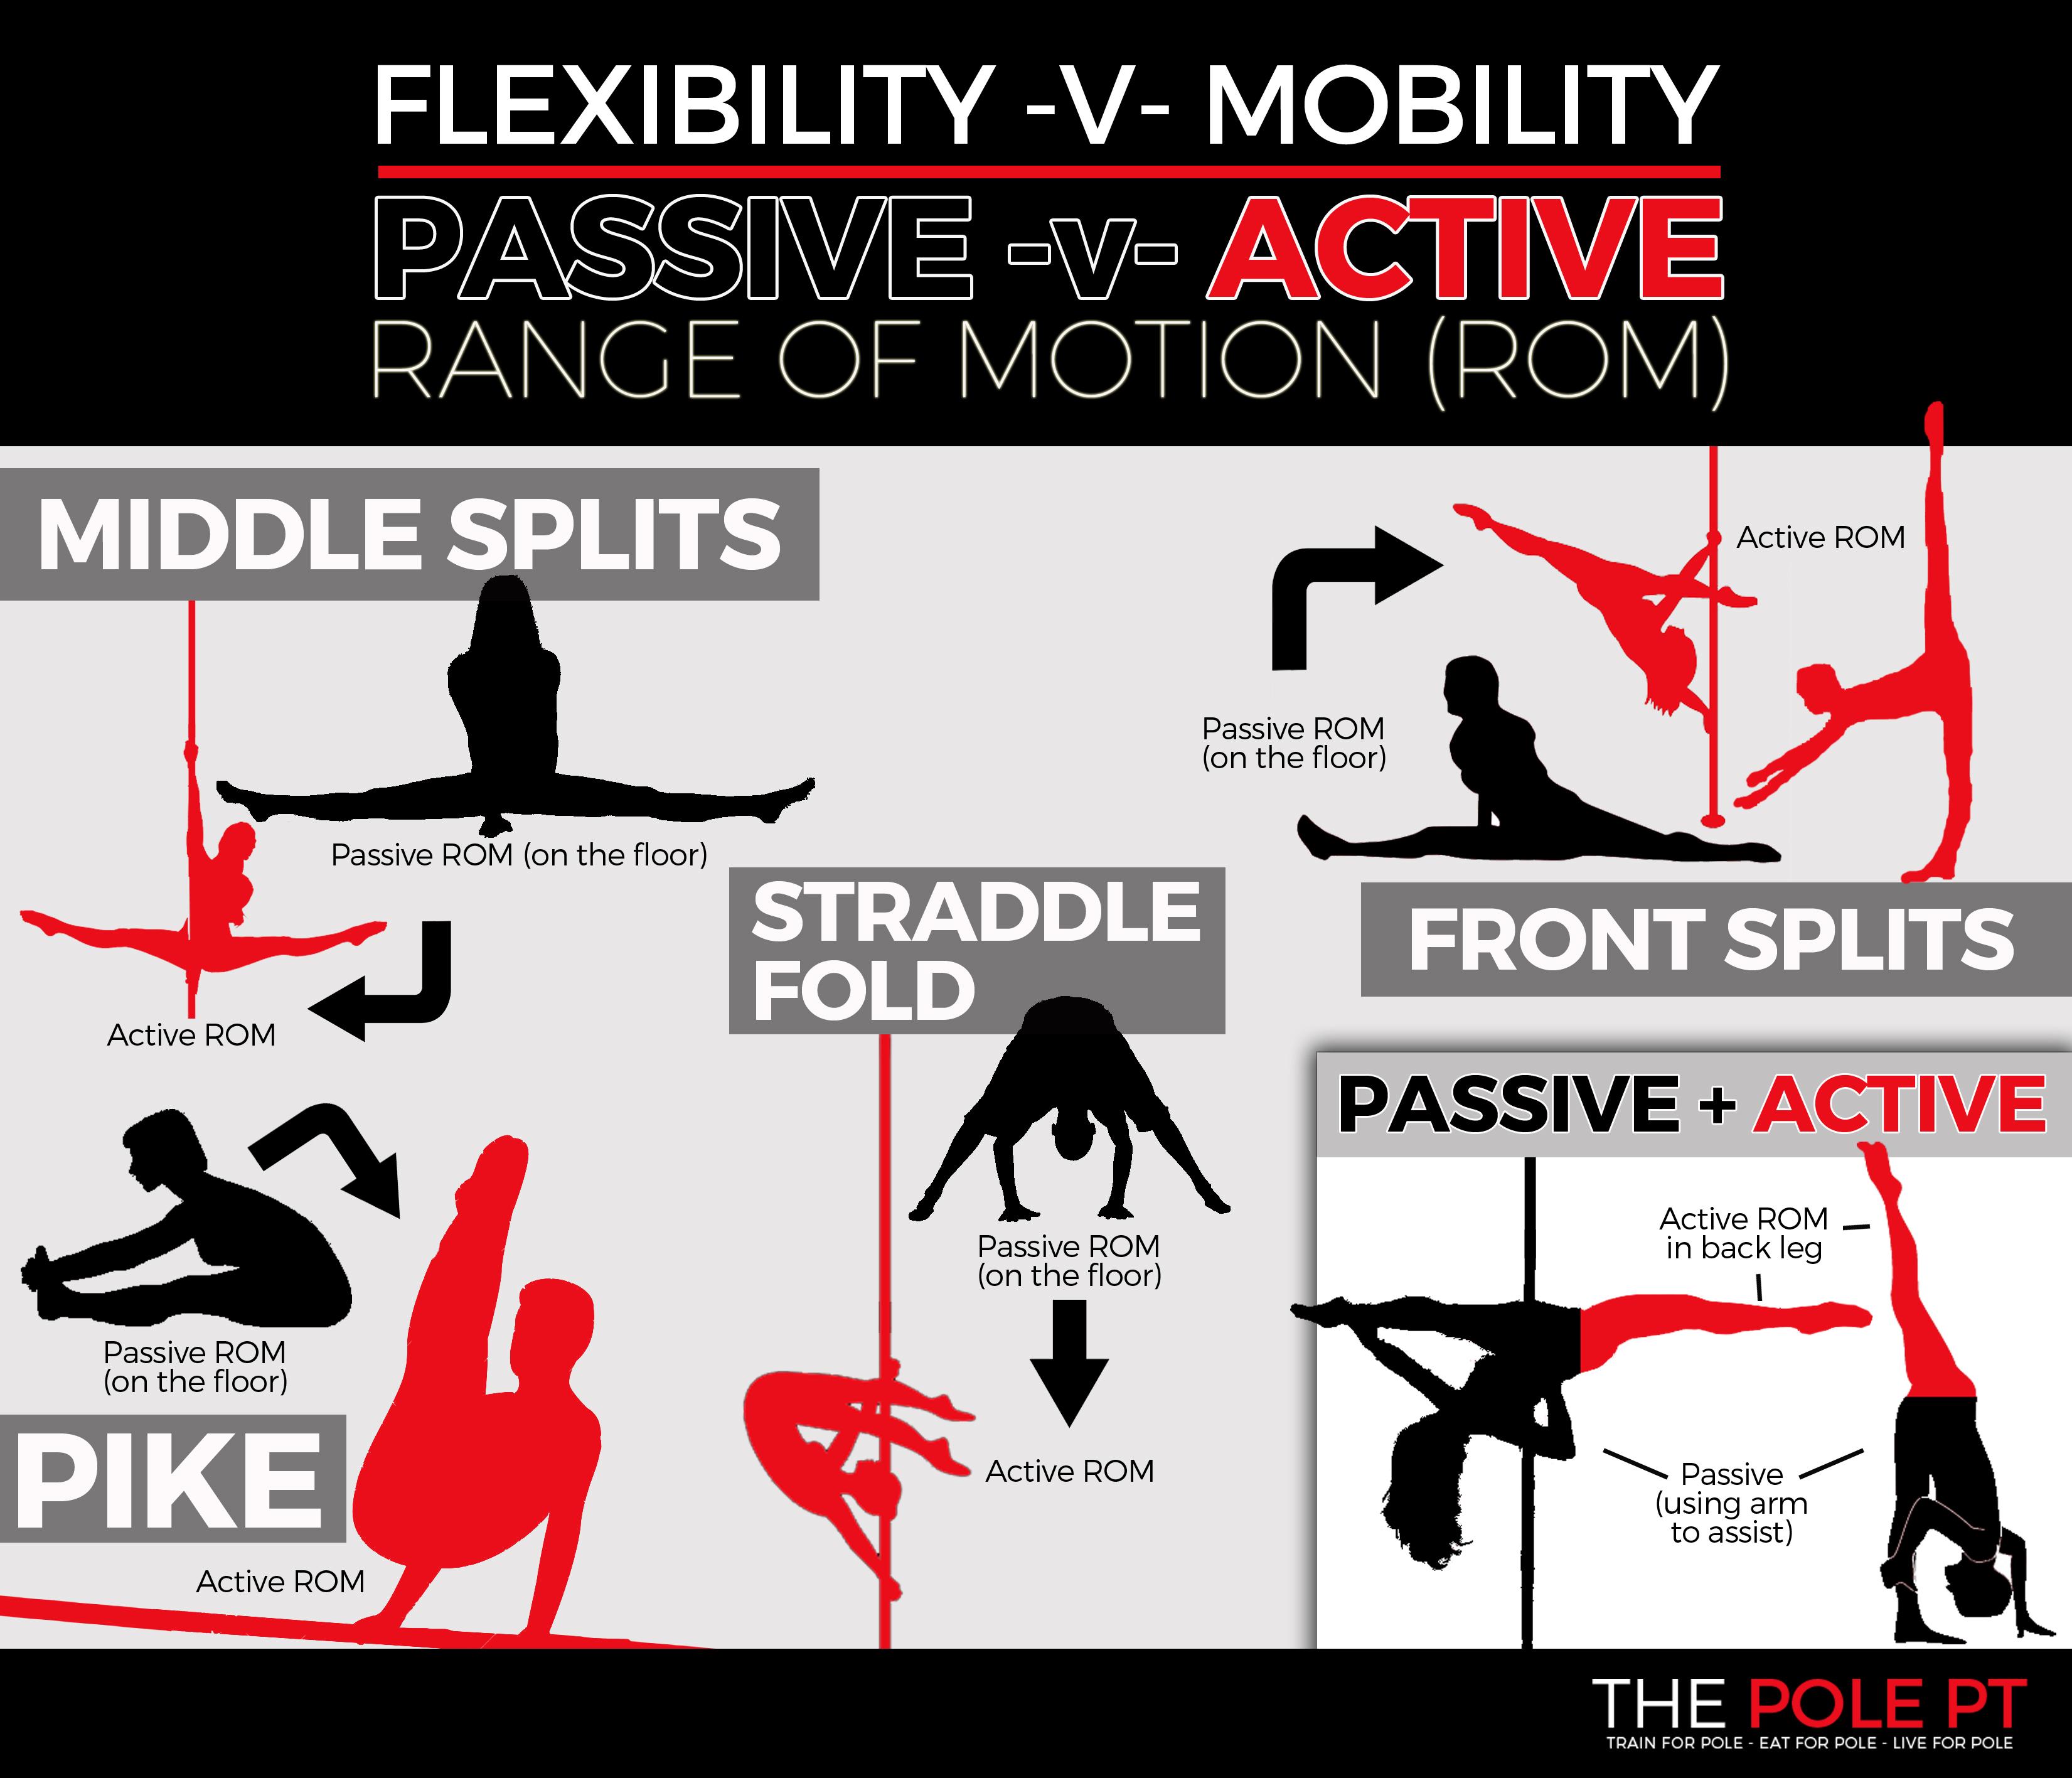 Flexibility v mobility pole dance